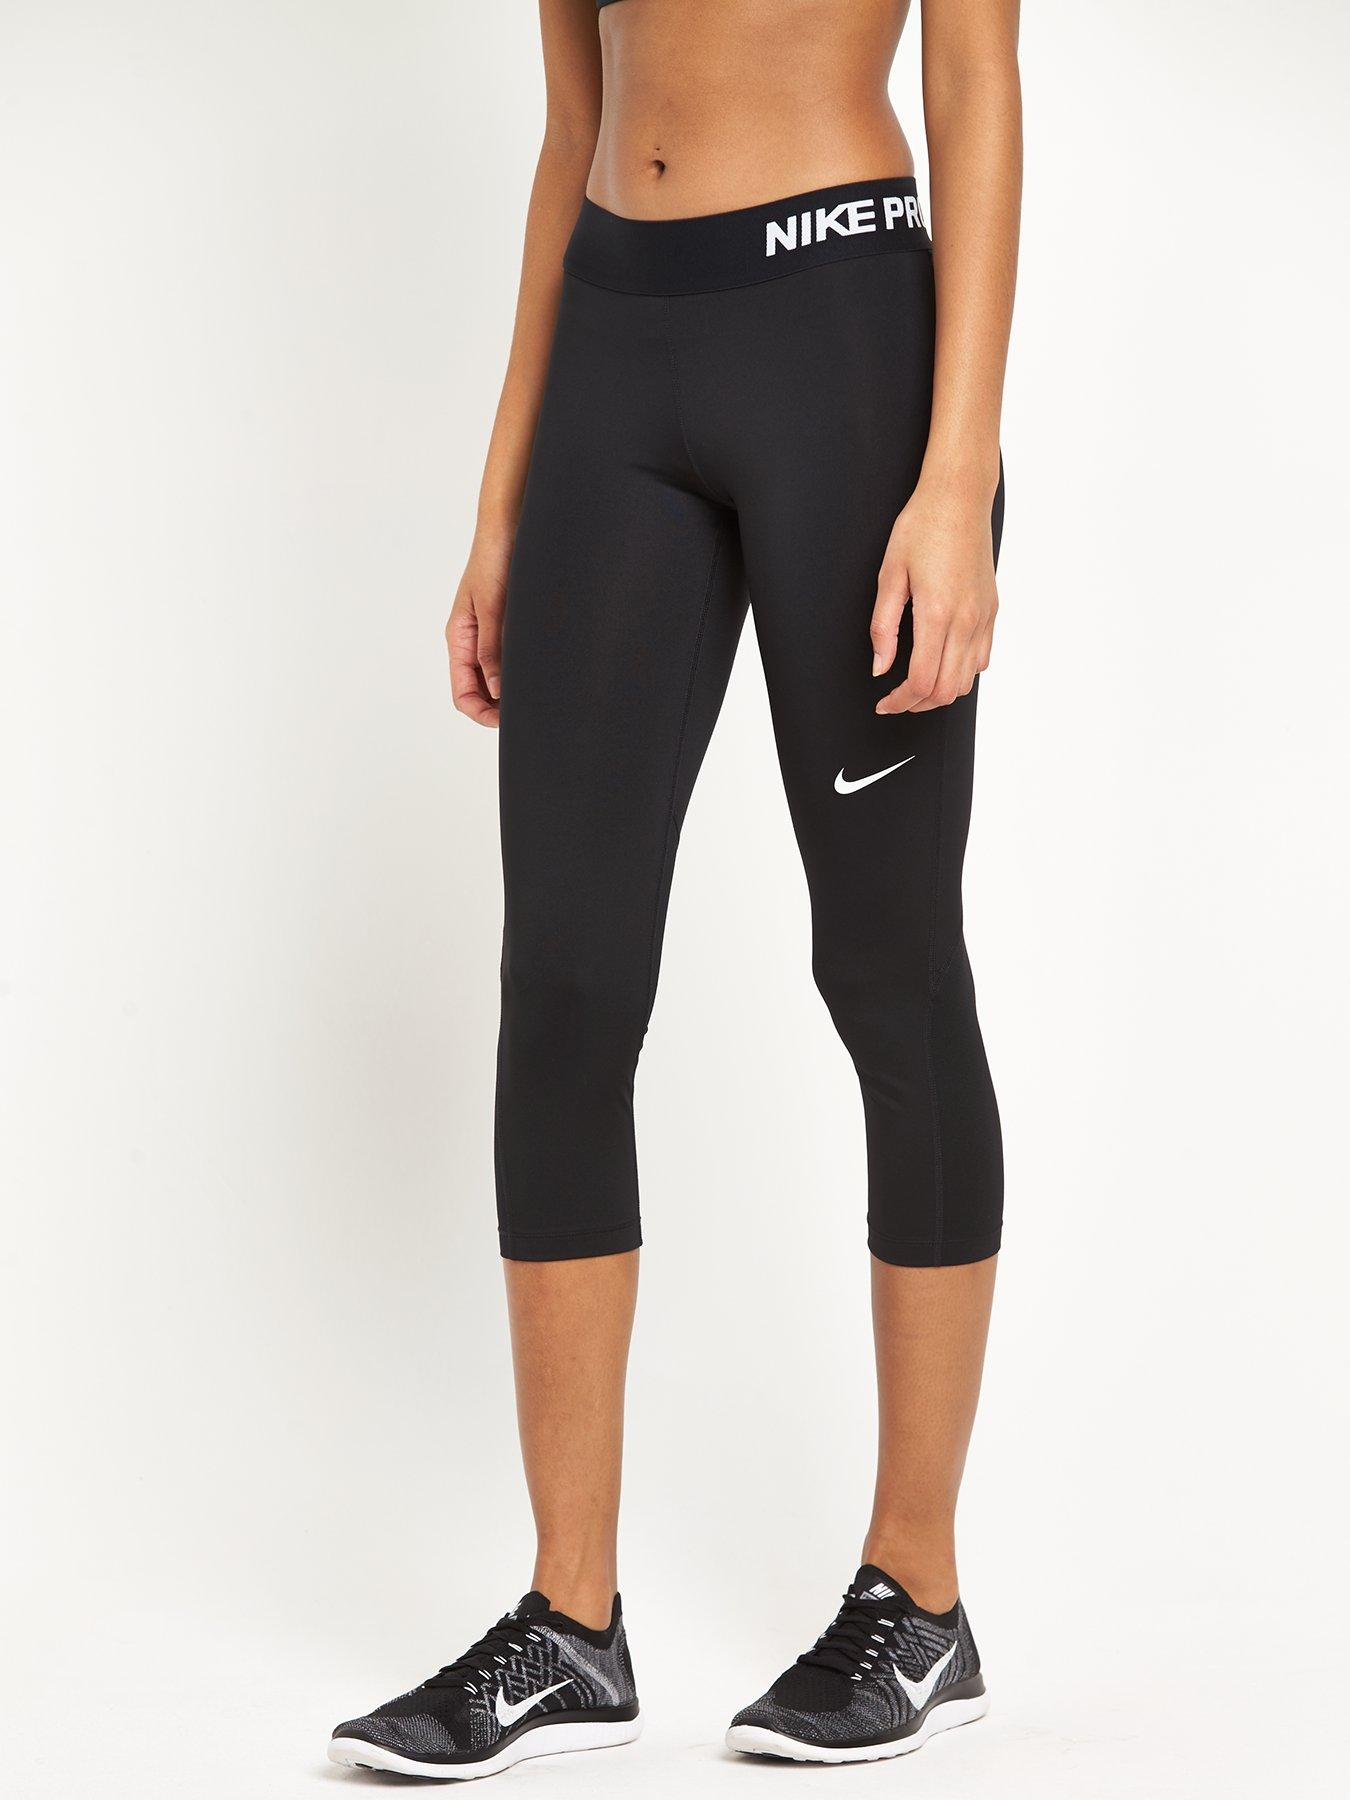 OFF52%| Buy ladies nike clothing u0026gt; Free Shipping